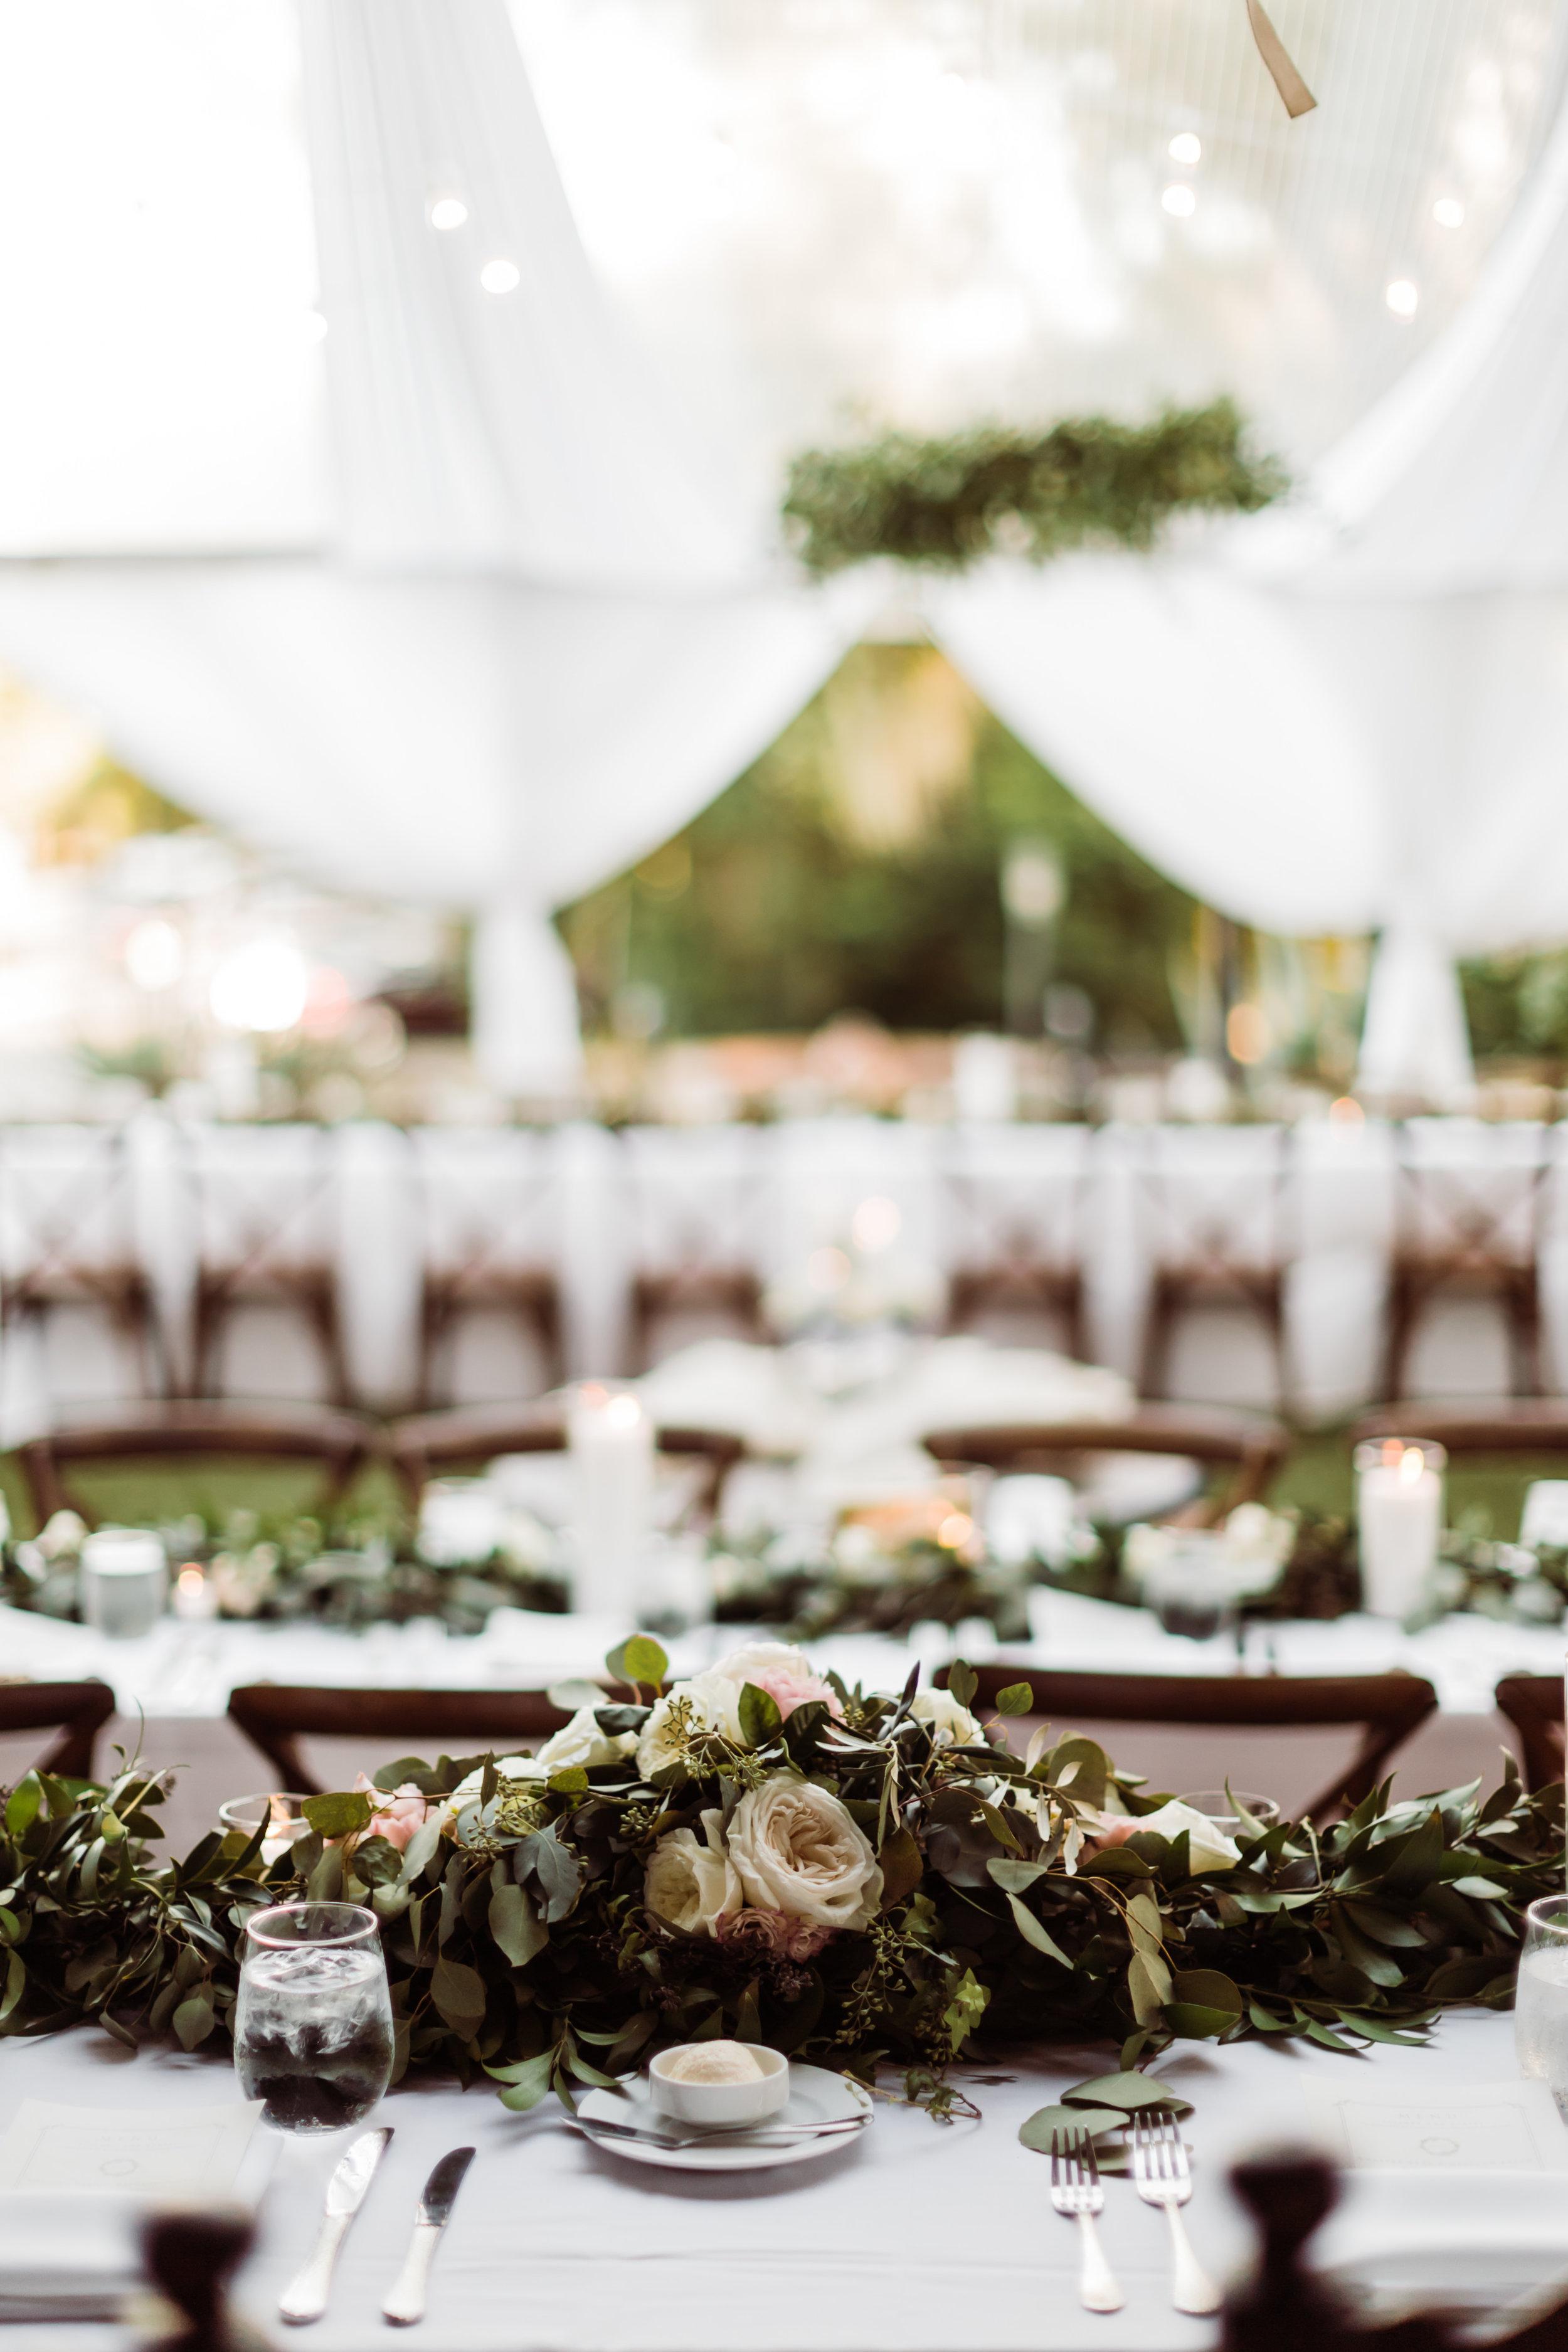 2017.10.15 Steffi and Elliott Simmonds Casa Feliz Wedding (627 of 969).jpg